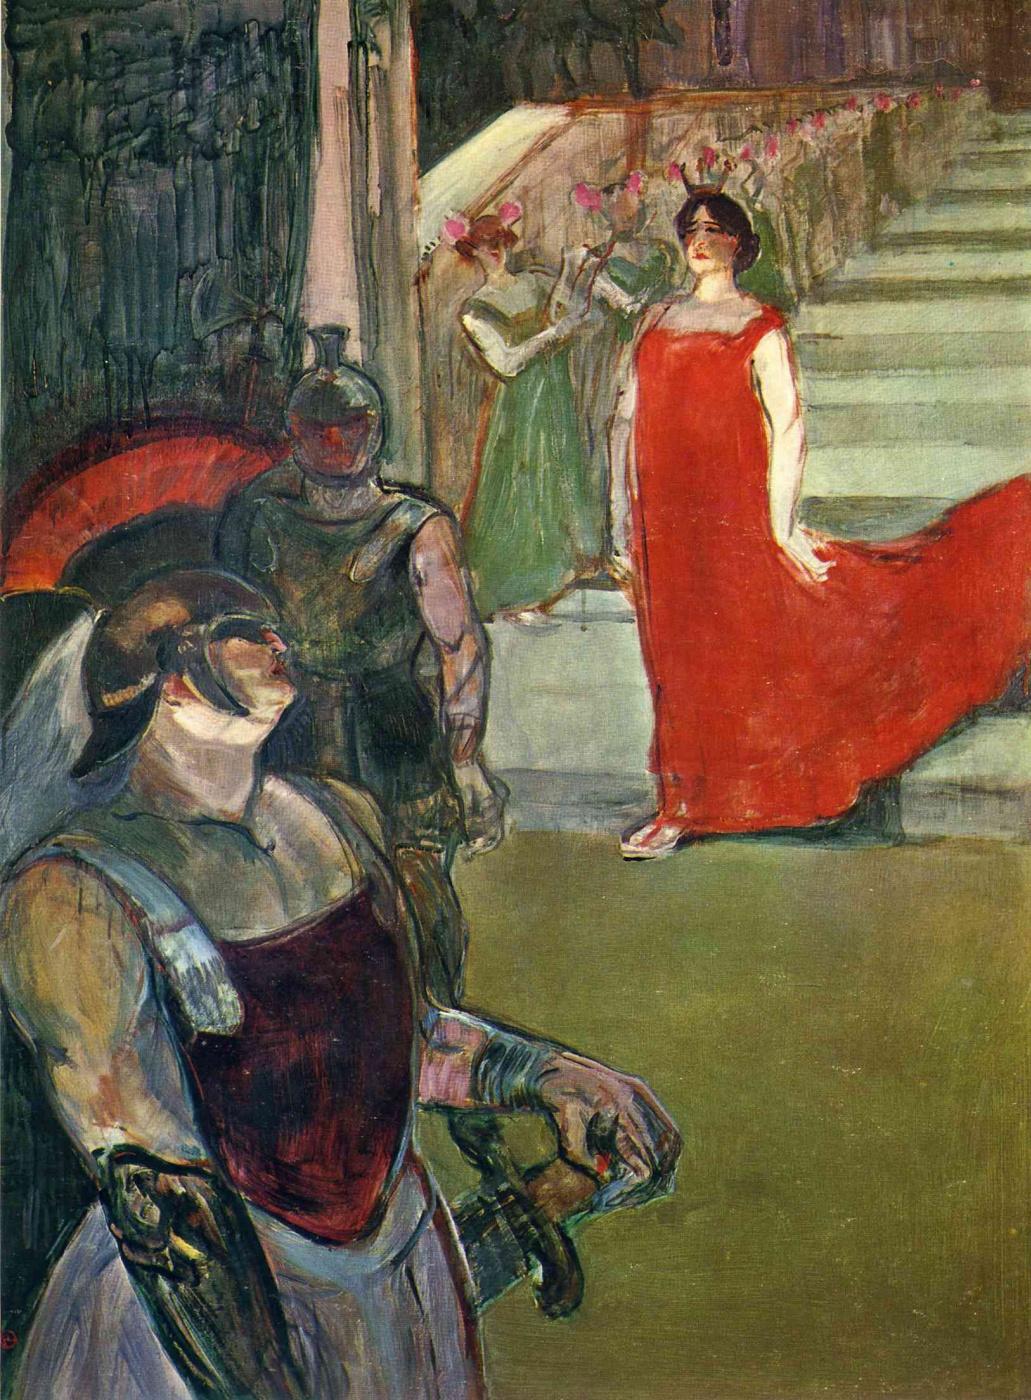 Henri de Toulouse-Lautrec. Scene from the opera Messalina in the opera Bordeaux